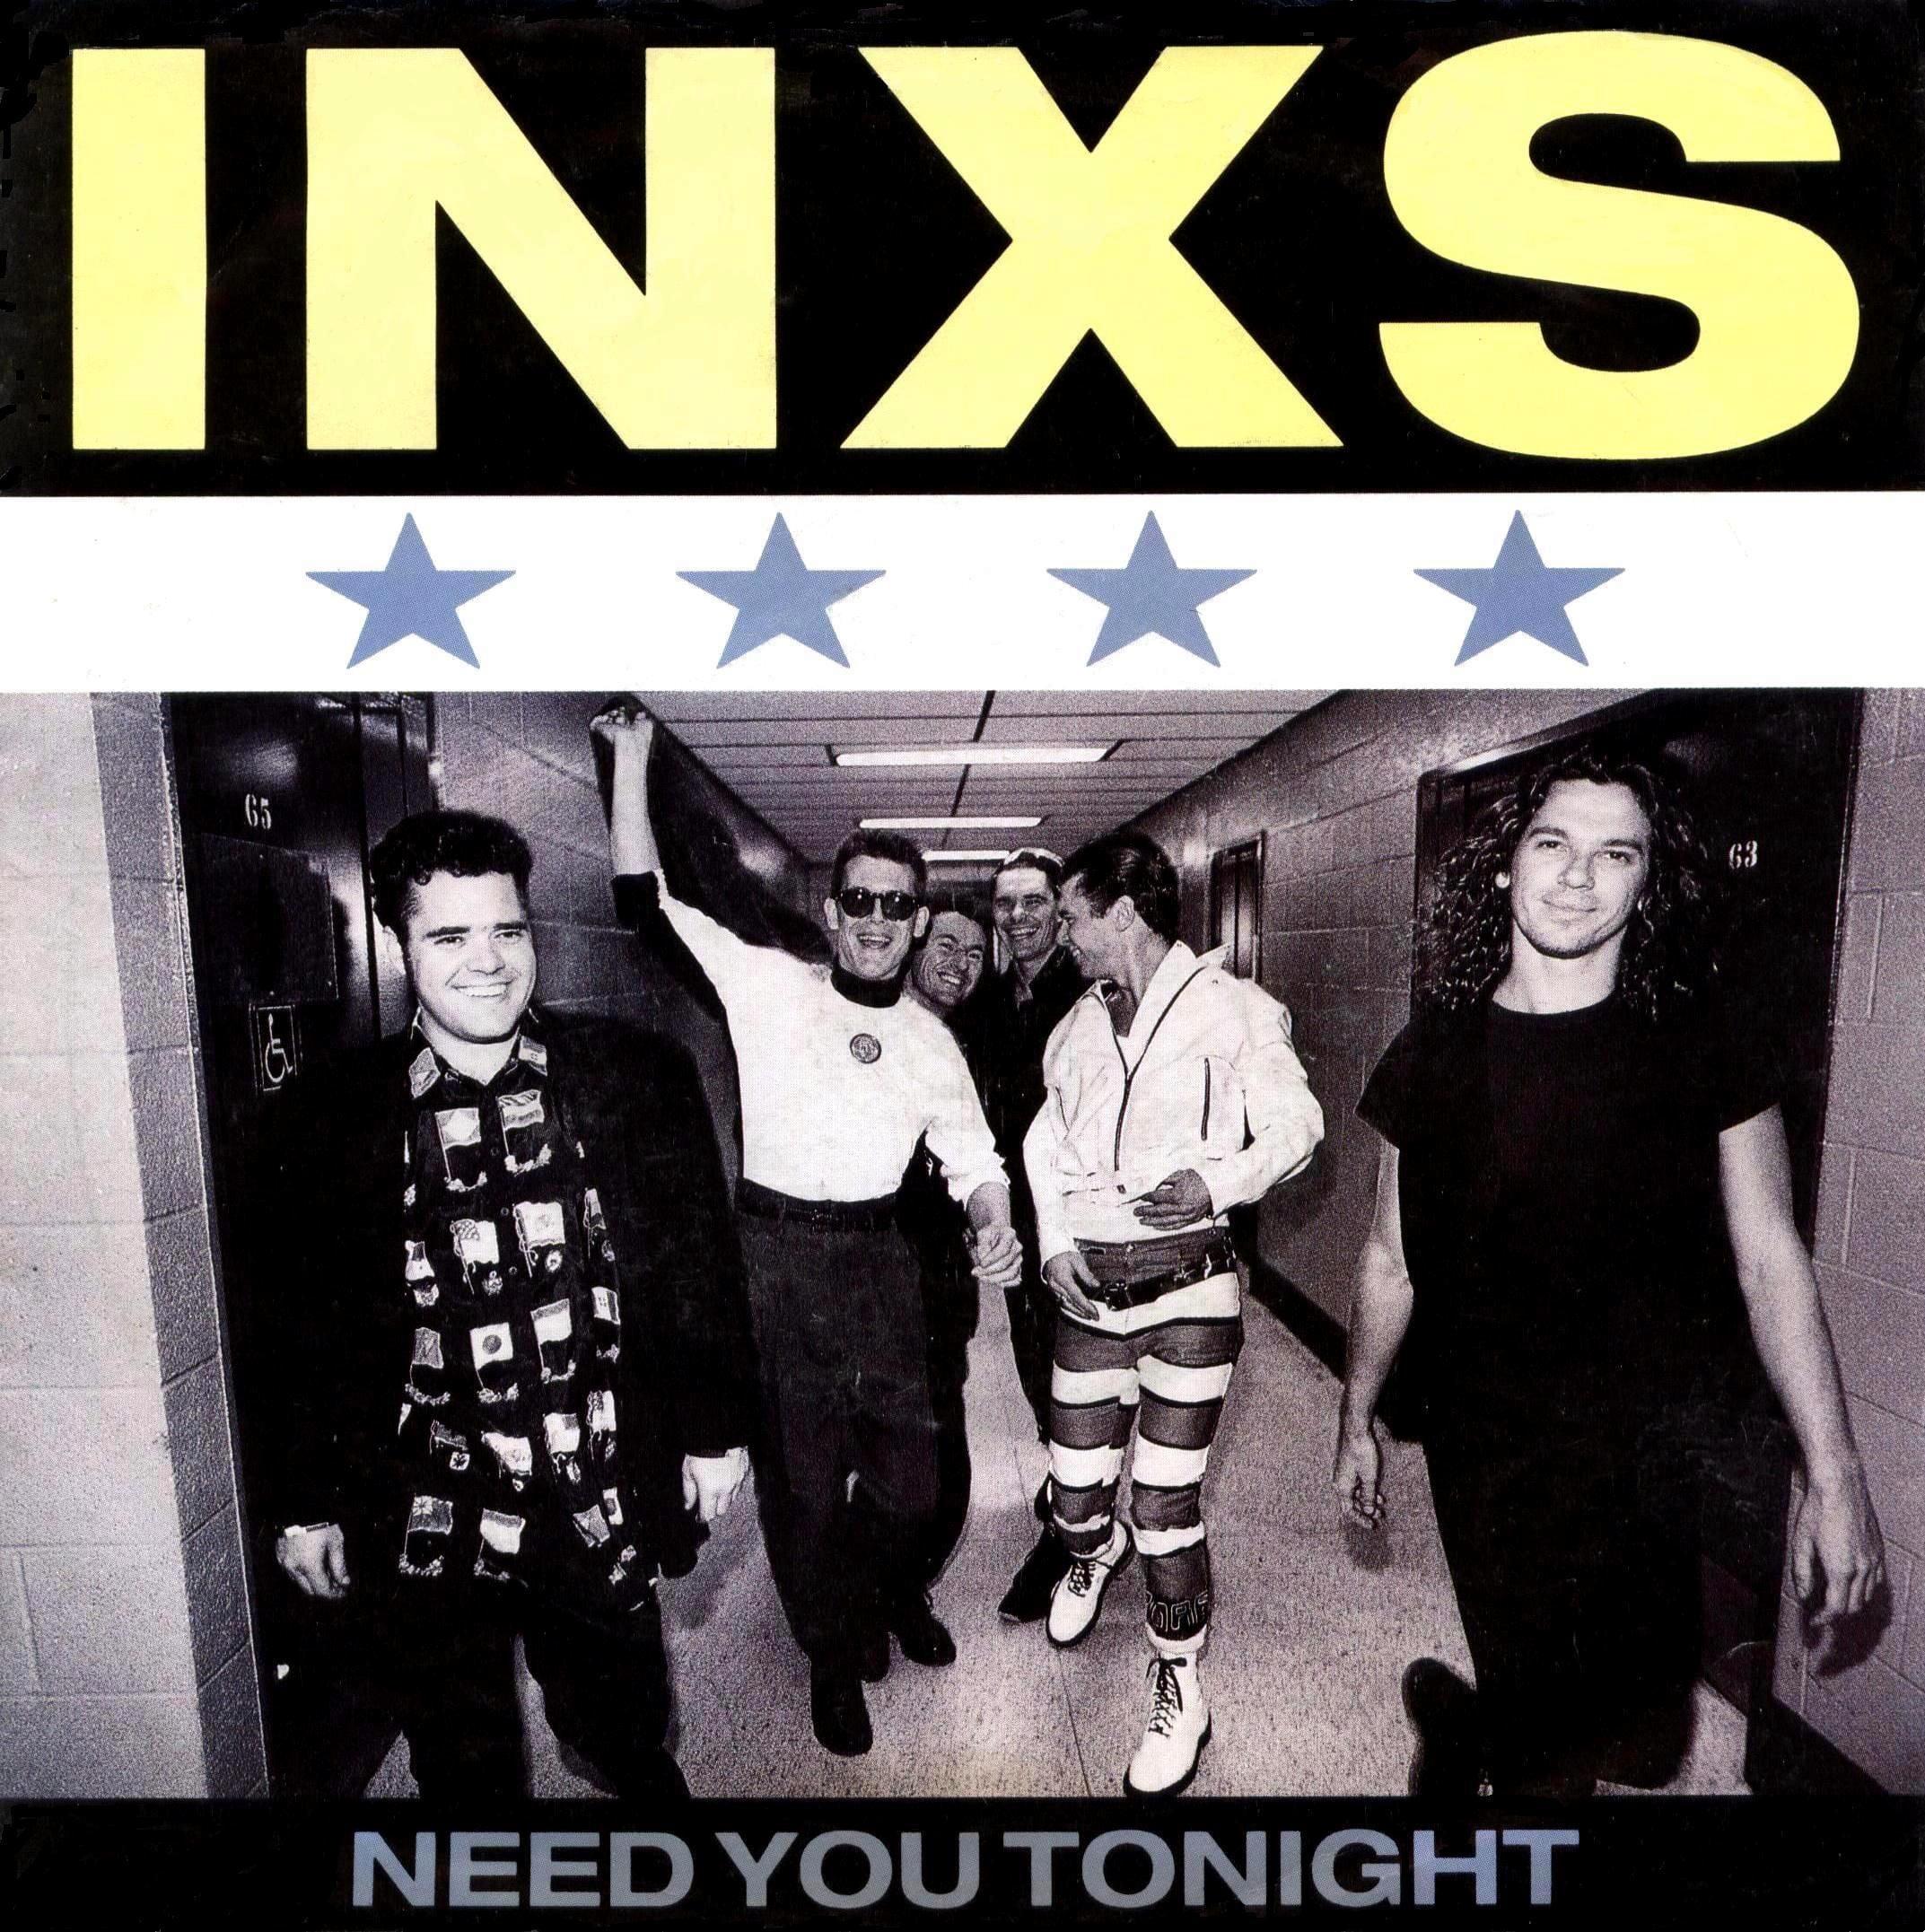 INXS – Need You Tonight (KRM House Dub)